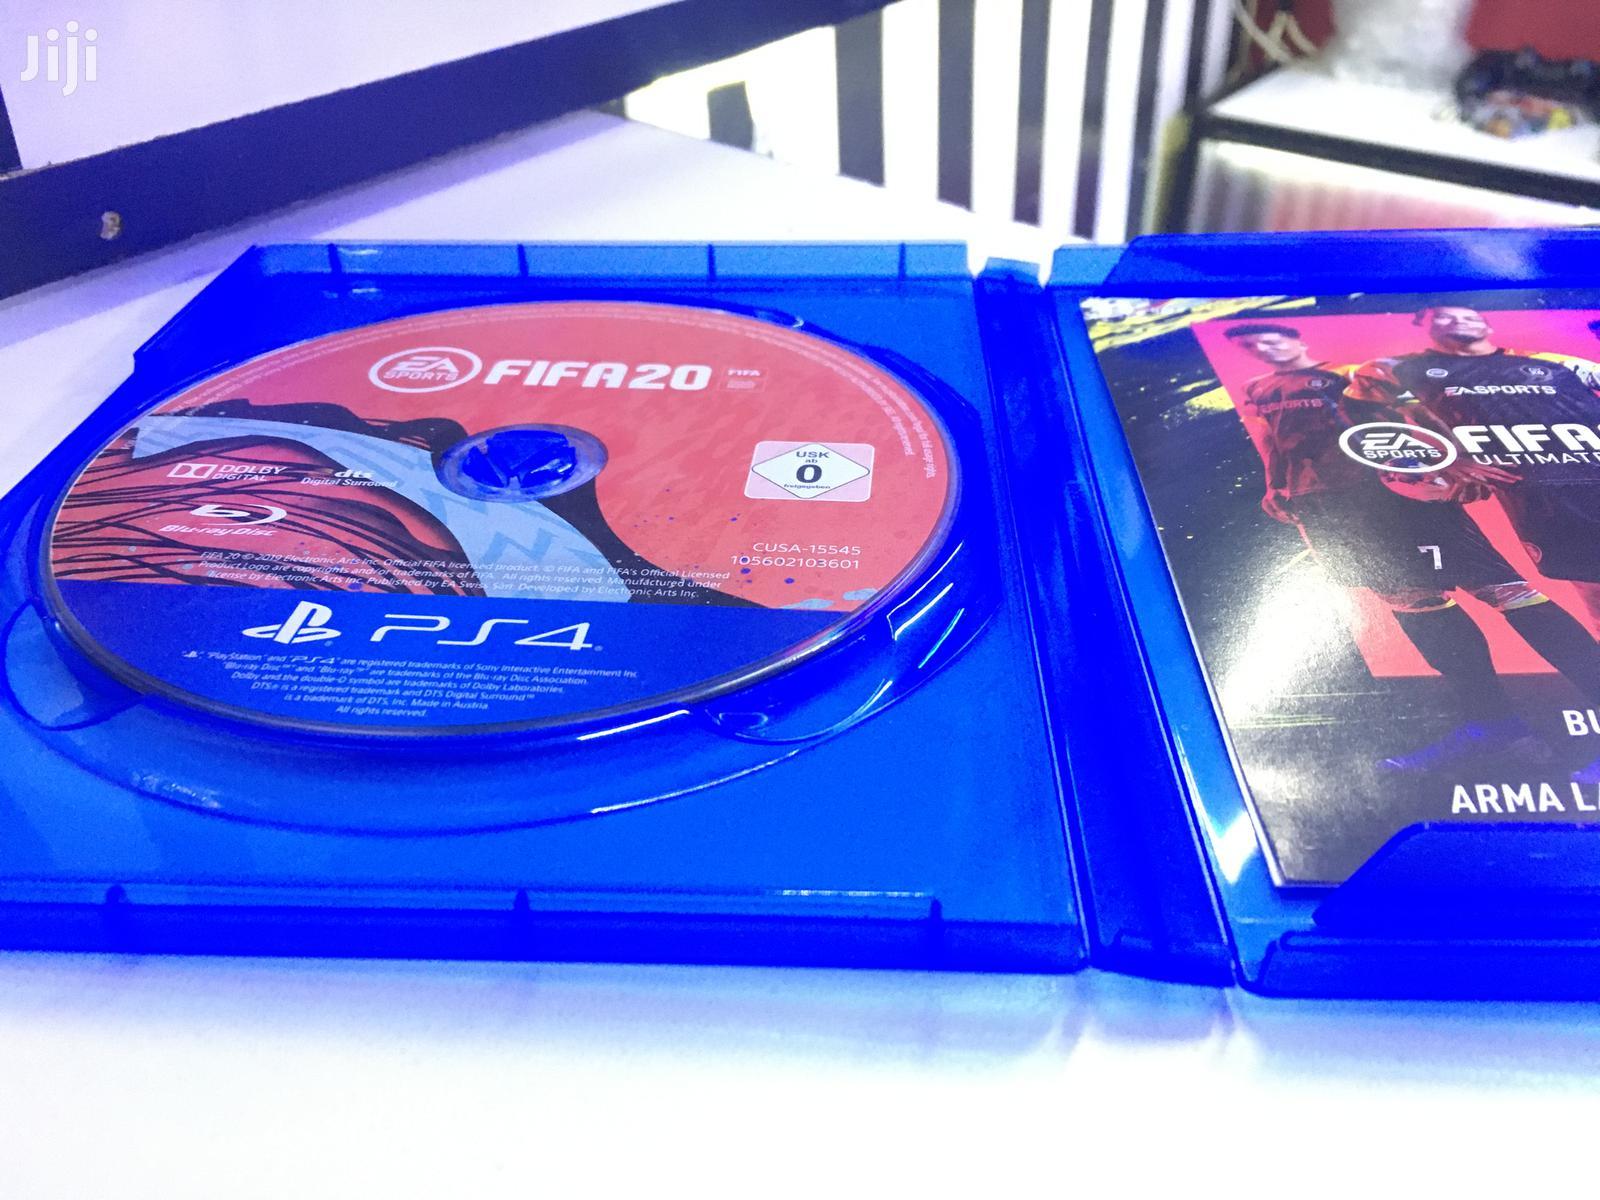 Used Fifa 20 | Video Games for sale in Nairobi Central, Nairobi, Kenya